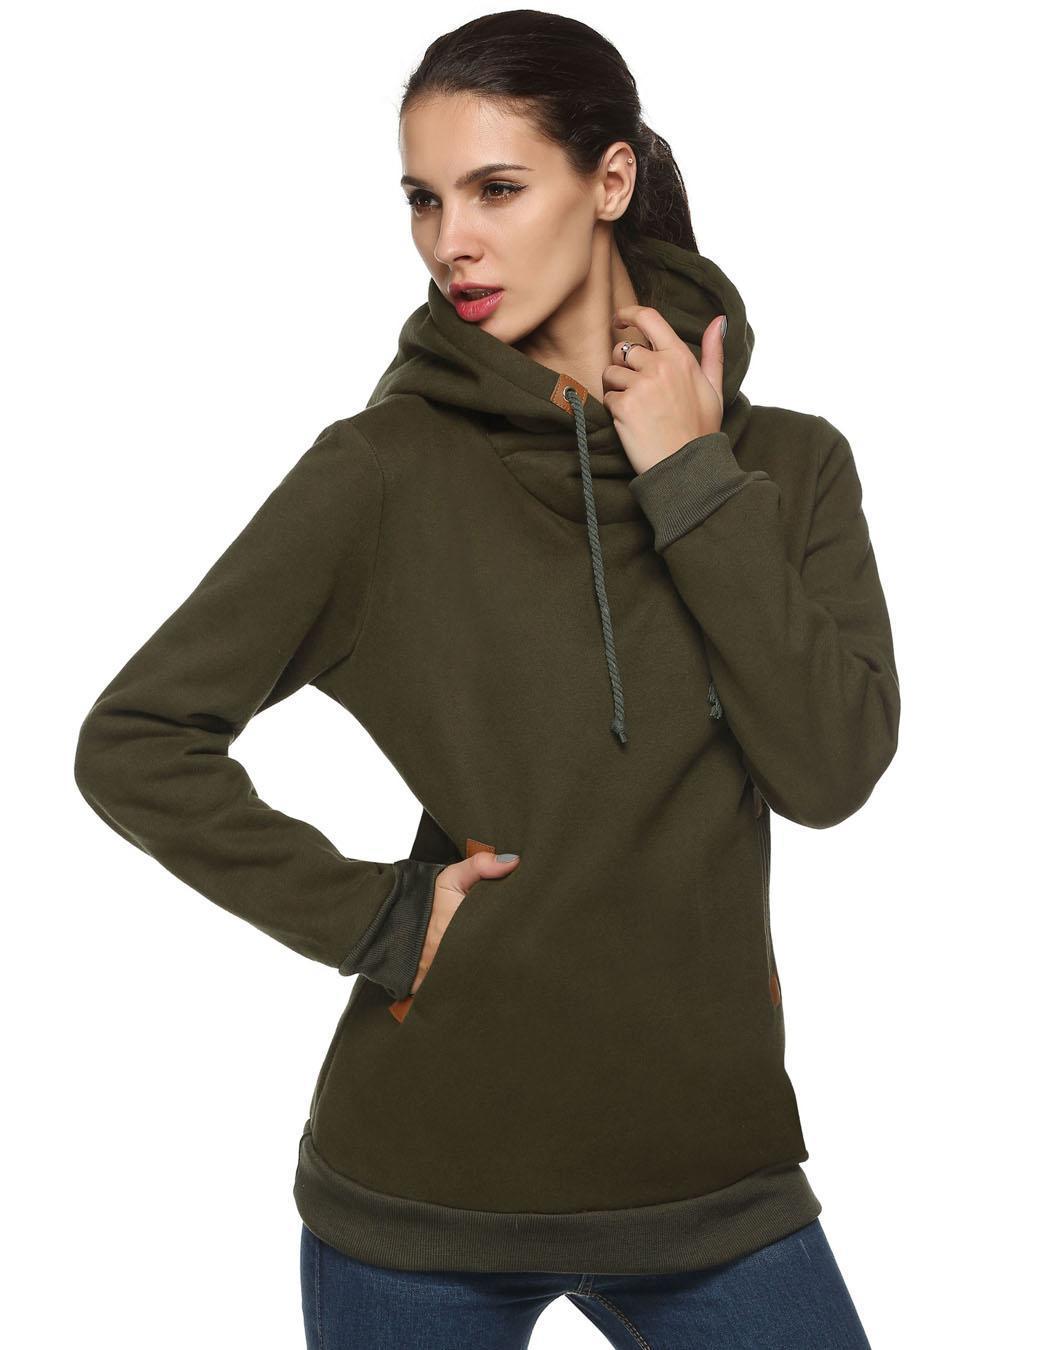 Women Long Sleeve Casual Pullover Hooded Sweatershirt Hoodies 2